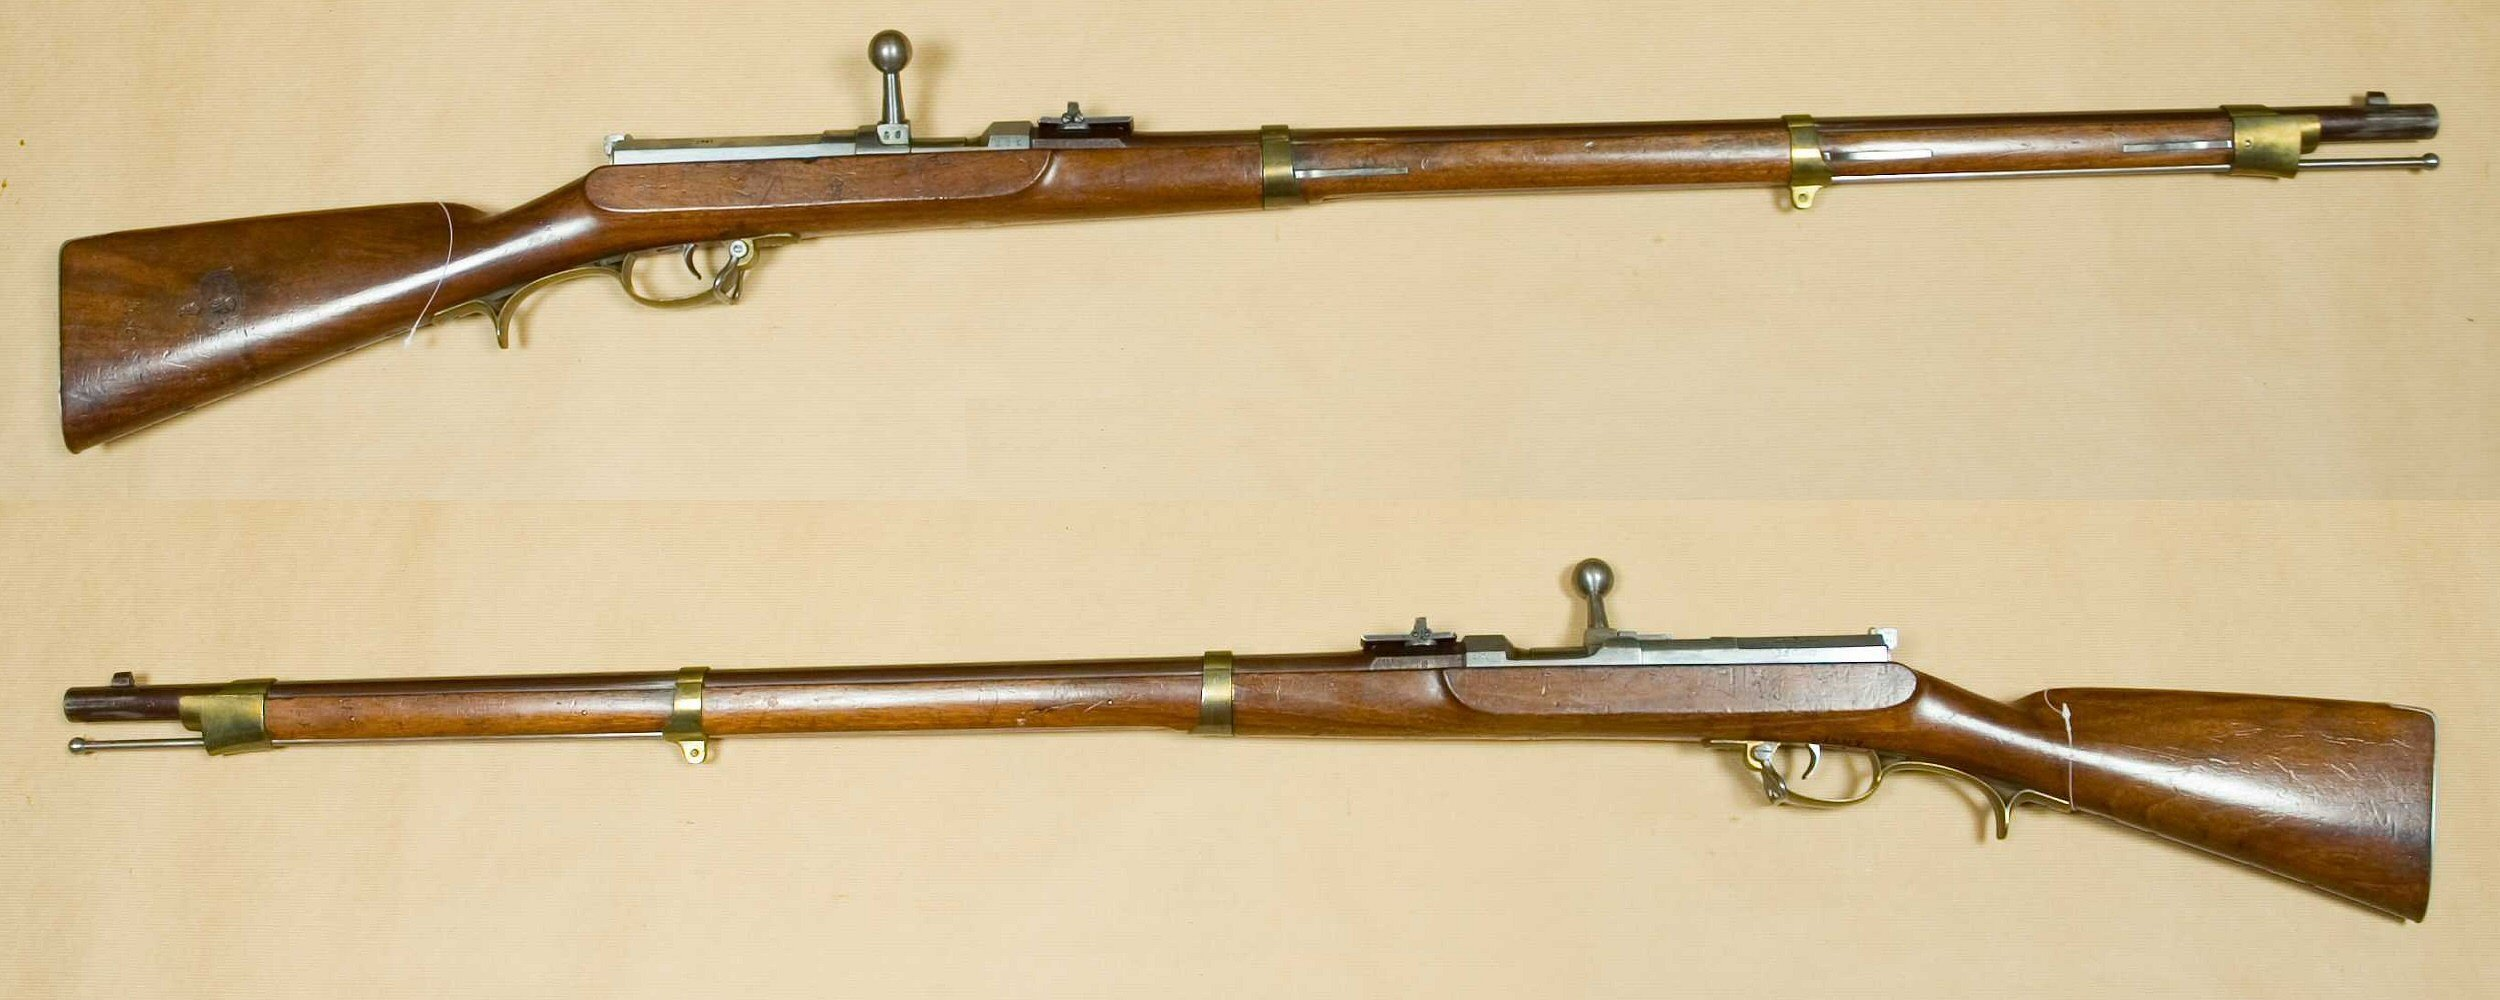 zundnadelgewehr-m-1841---preussen---arme